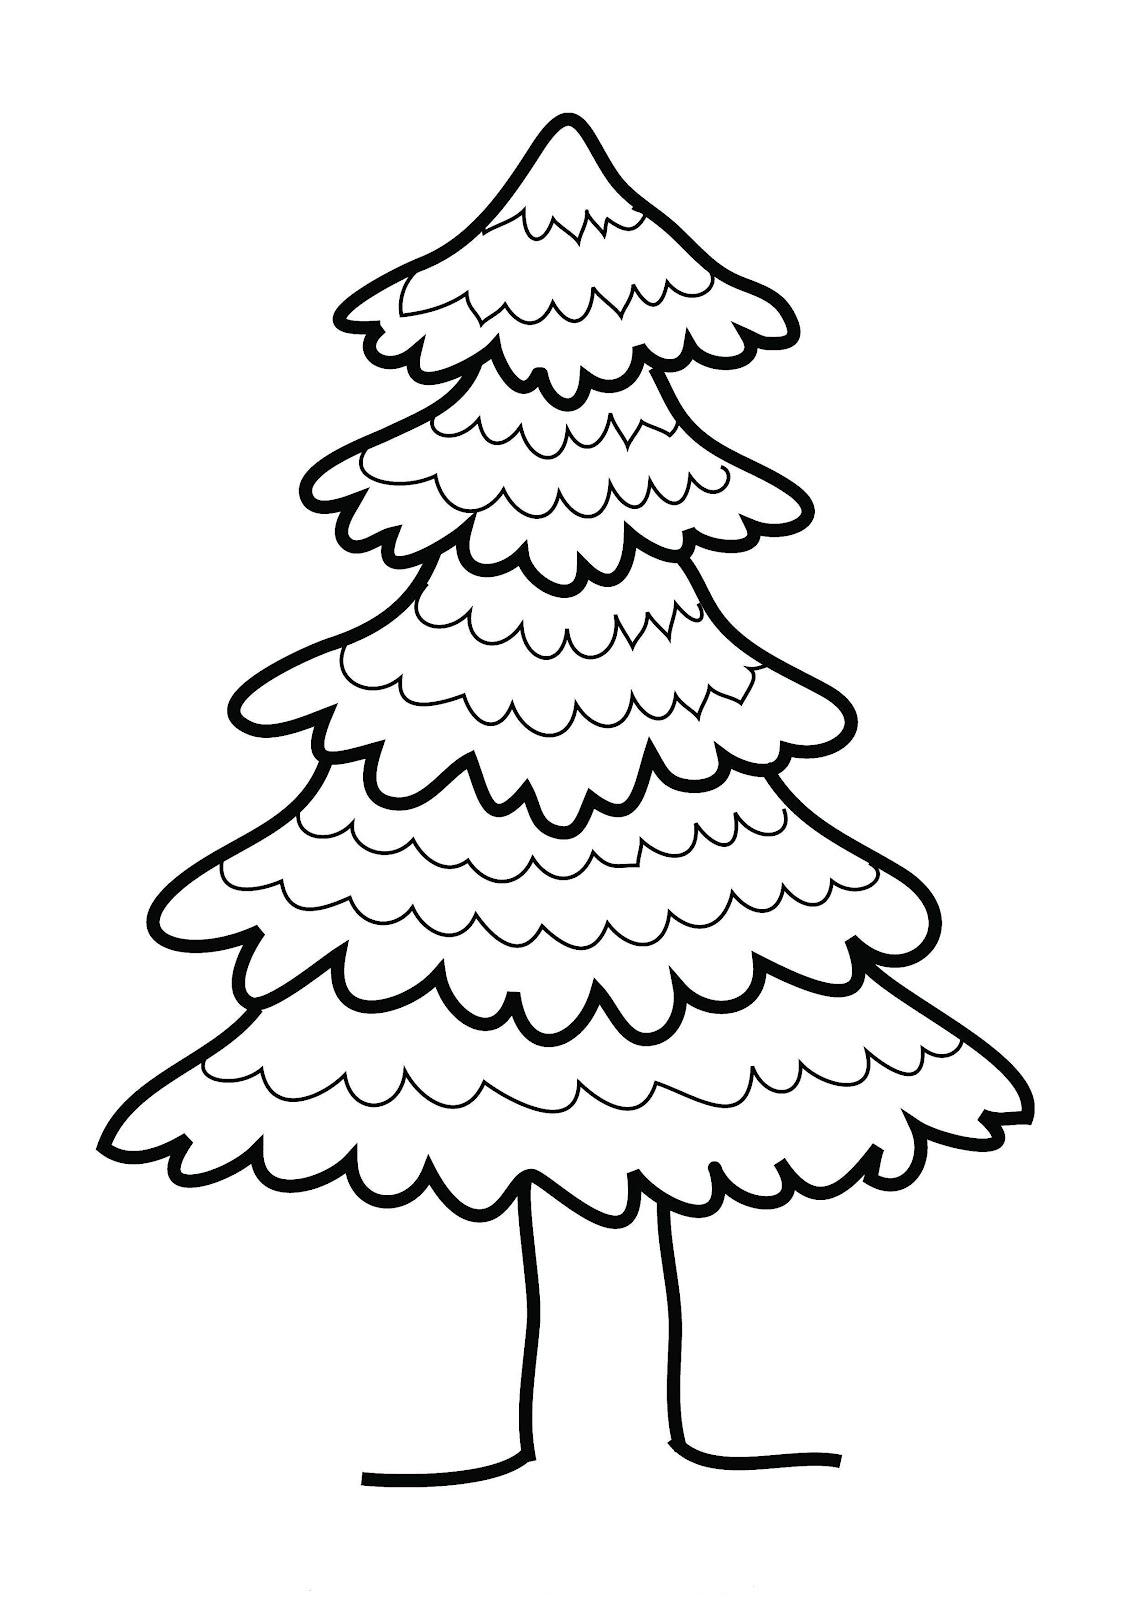 Tree Drawing Clip Art at GetDrawings